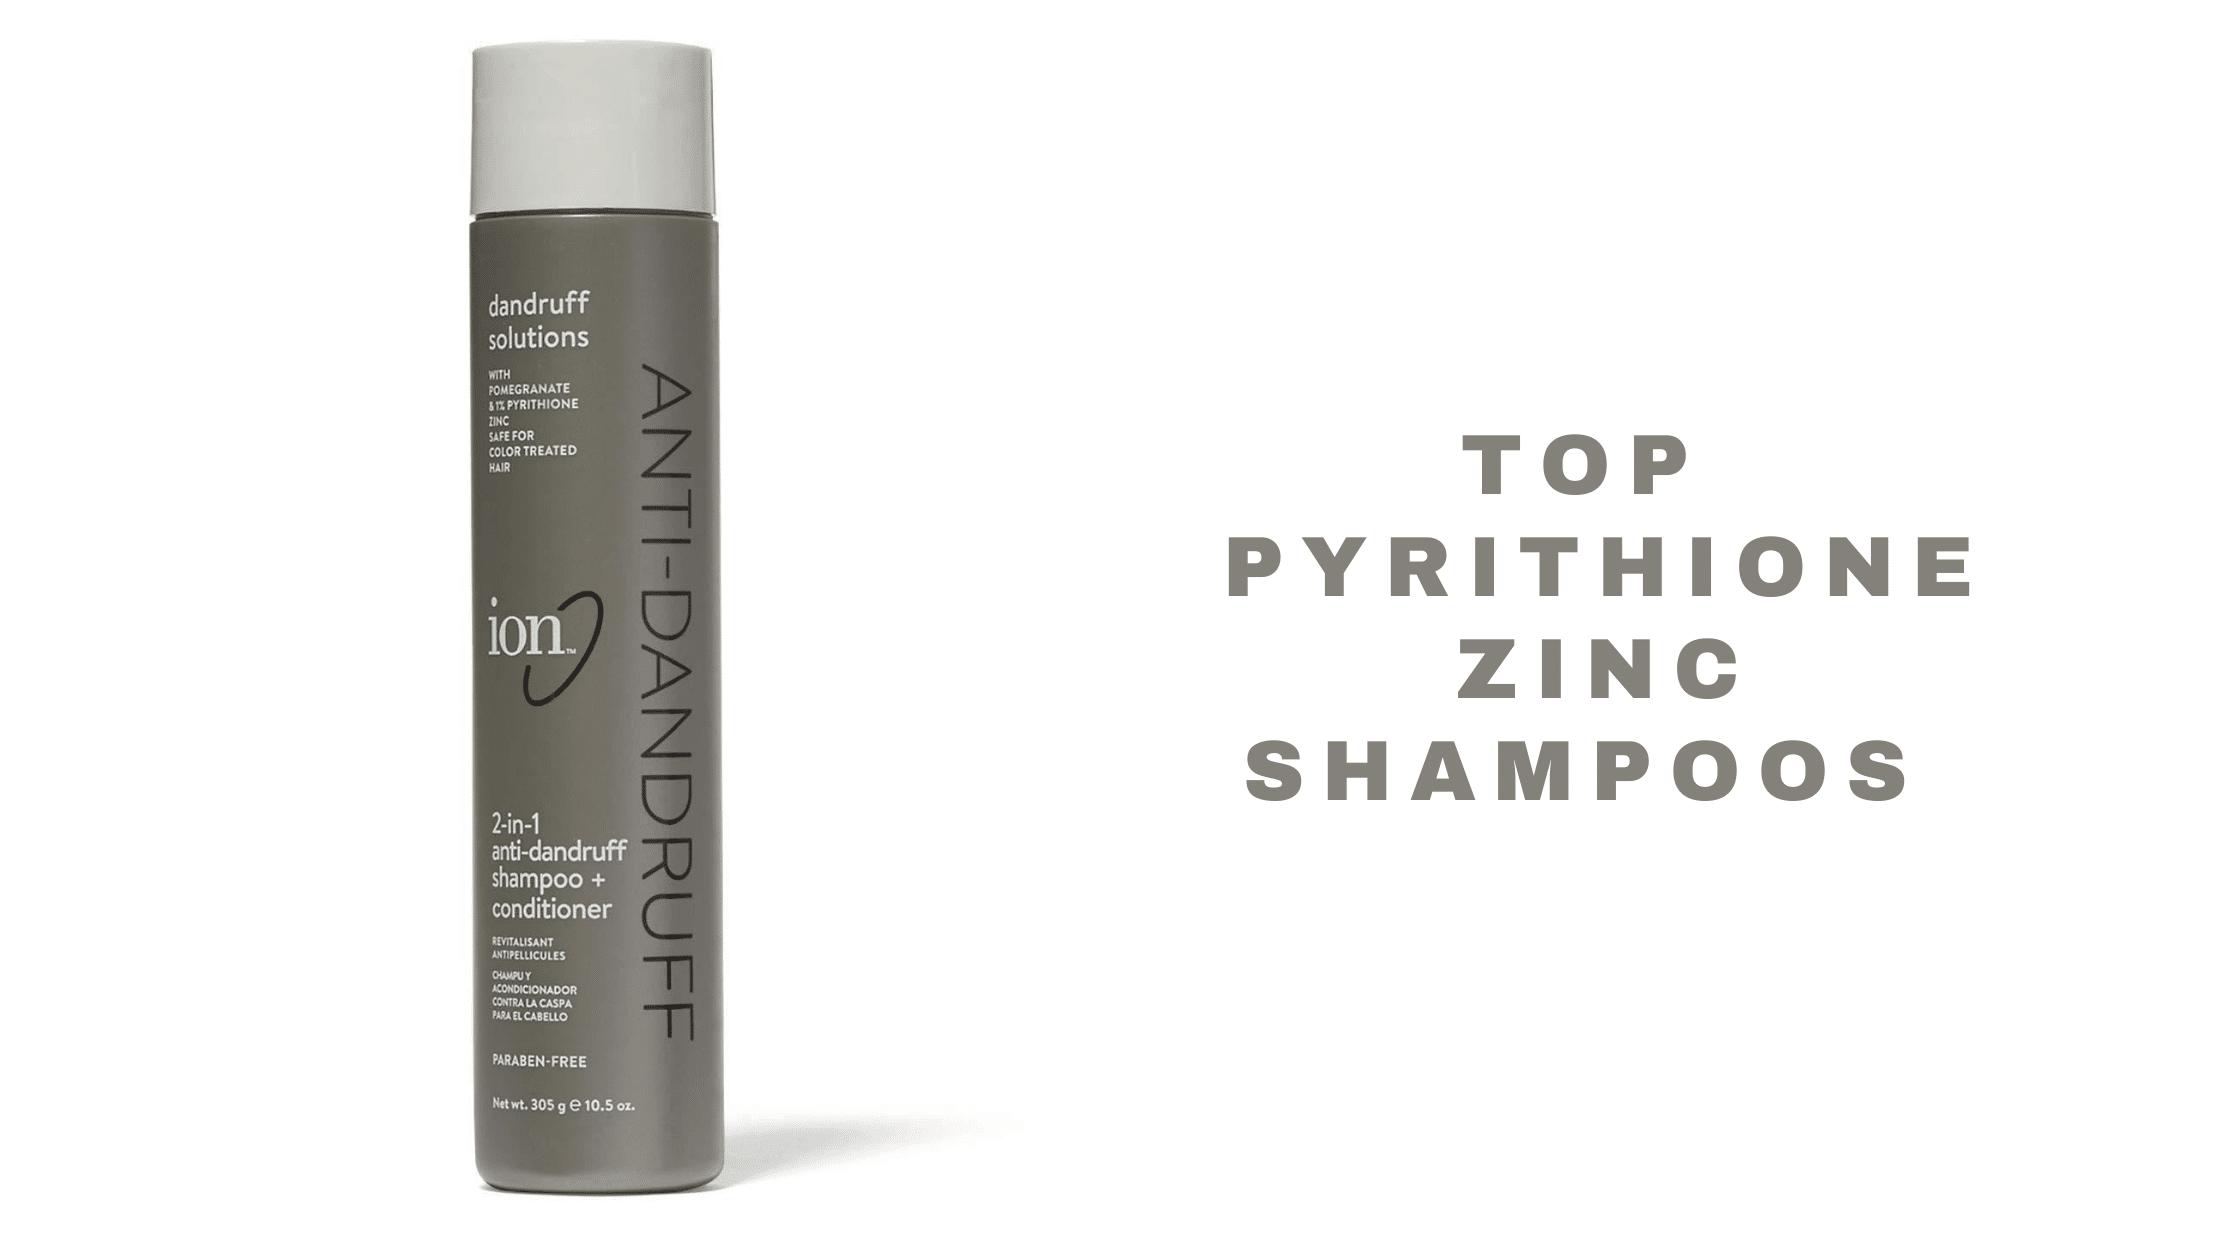 Top Pyrithione Zinc Shampoos 2021